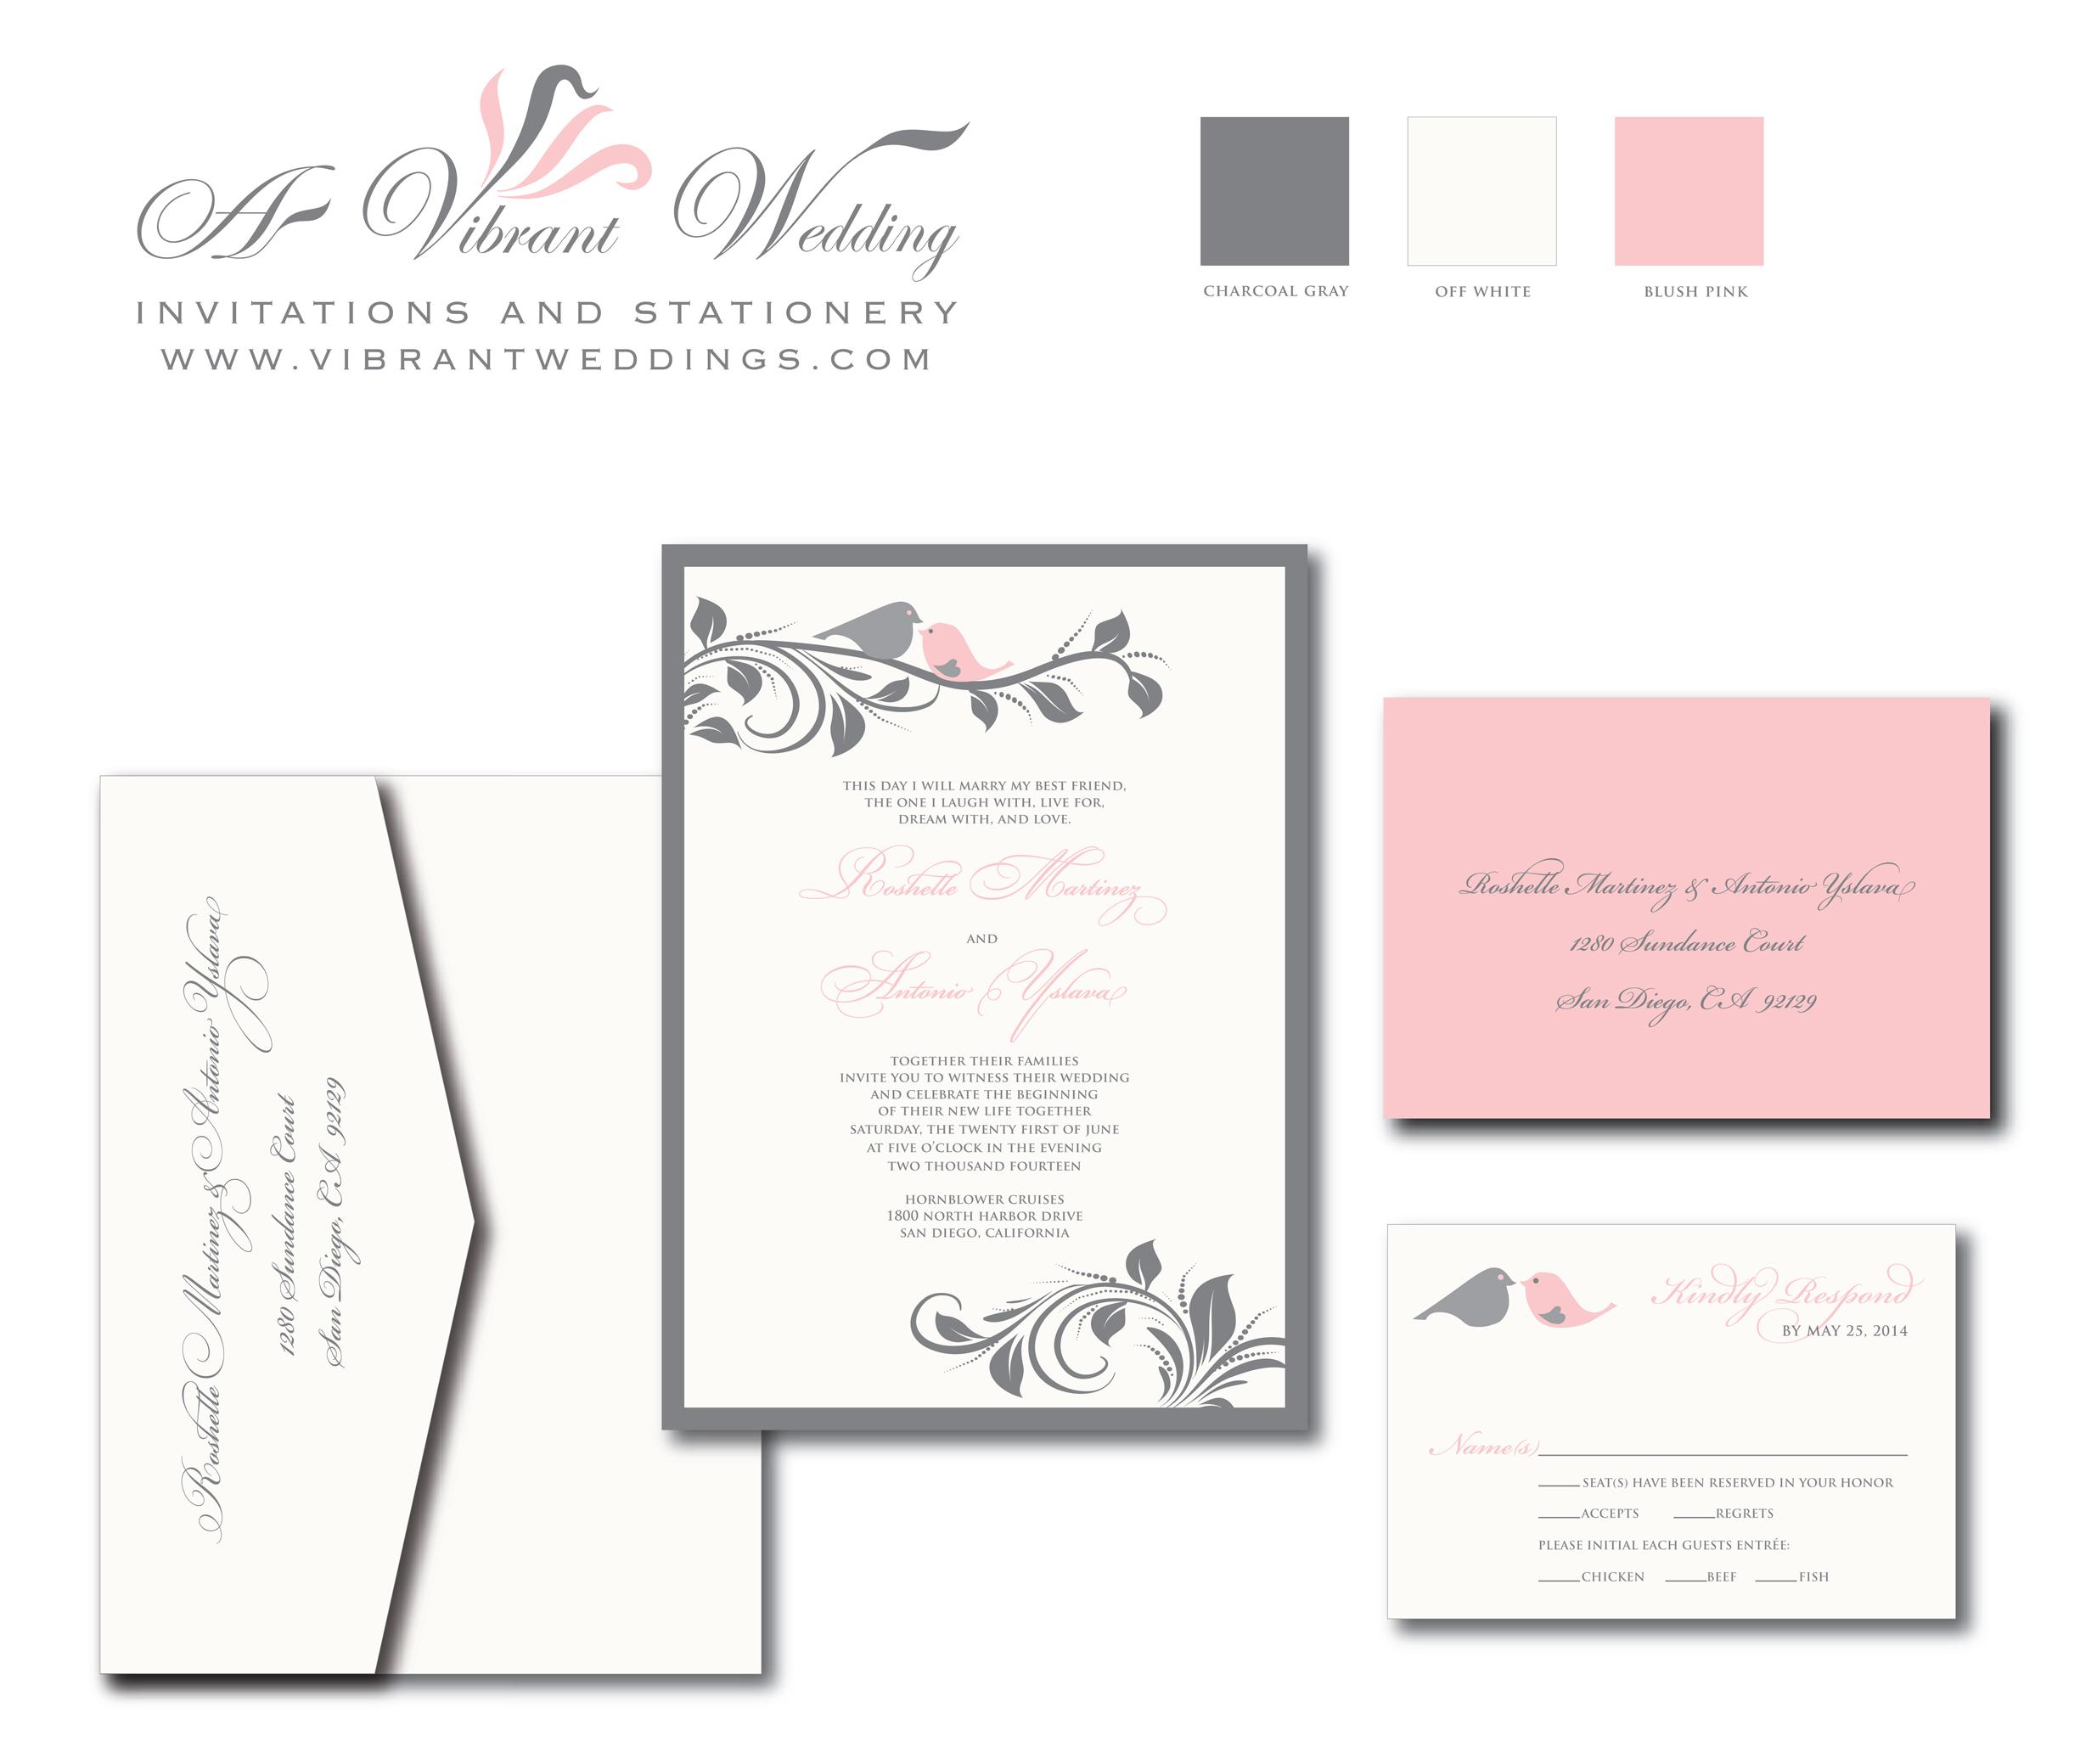 Wedding Scroll Invitations was adorable invitations sample